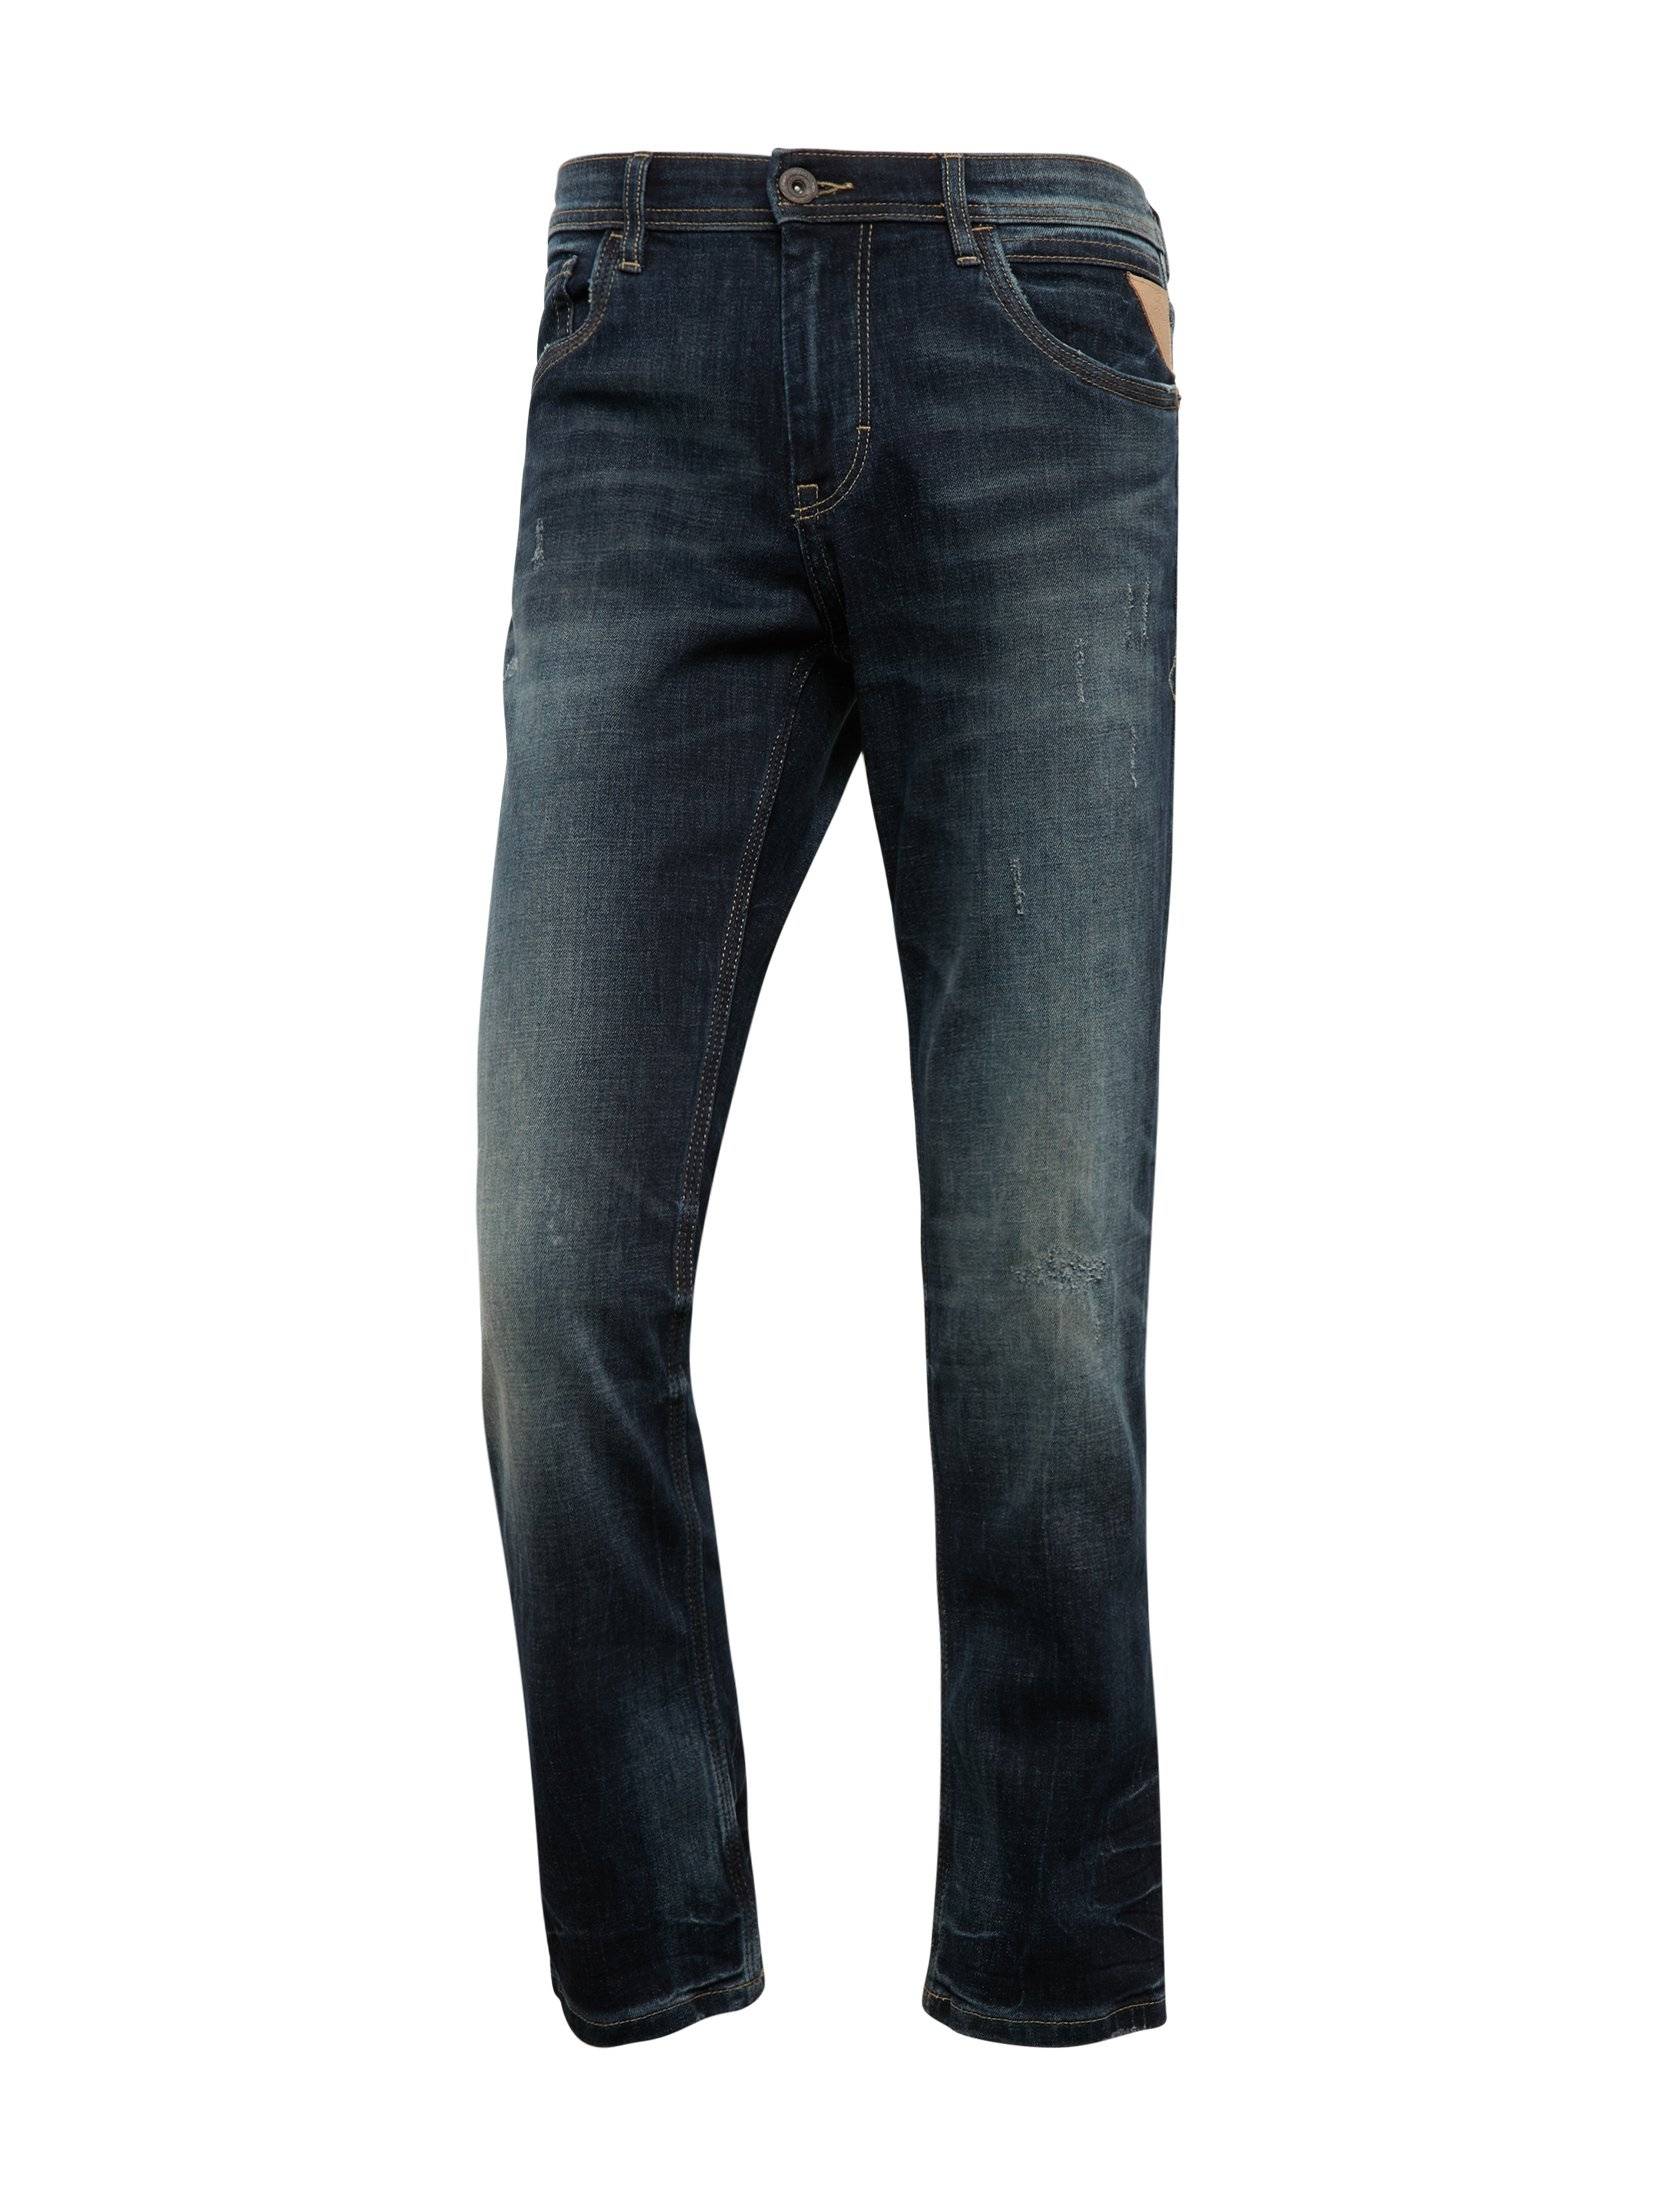 Tailor JeansBestel Nu Tom pocketsjeansmarvin Bij Straight 5 RL45jA